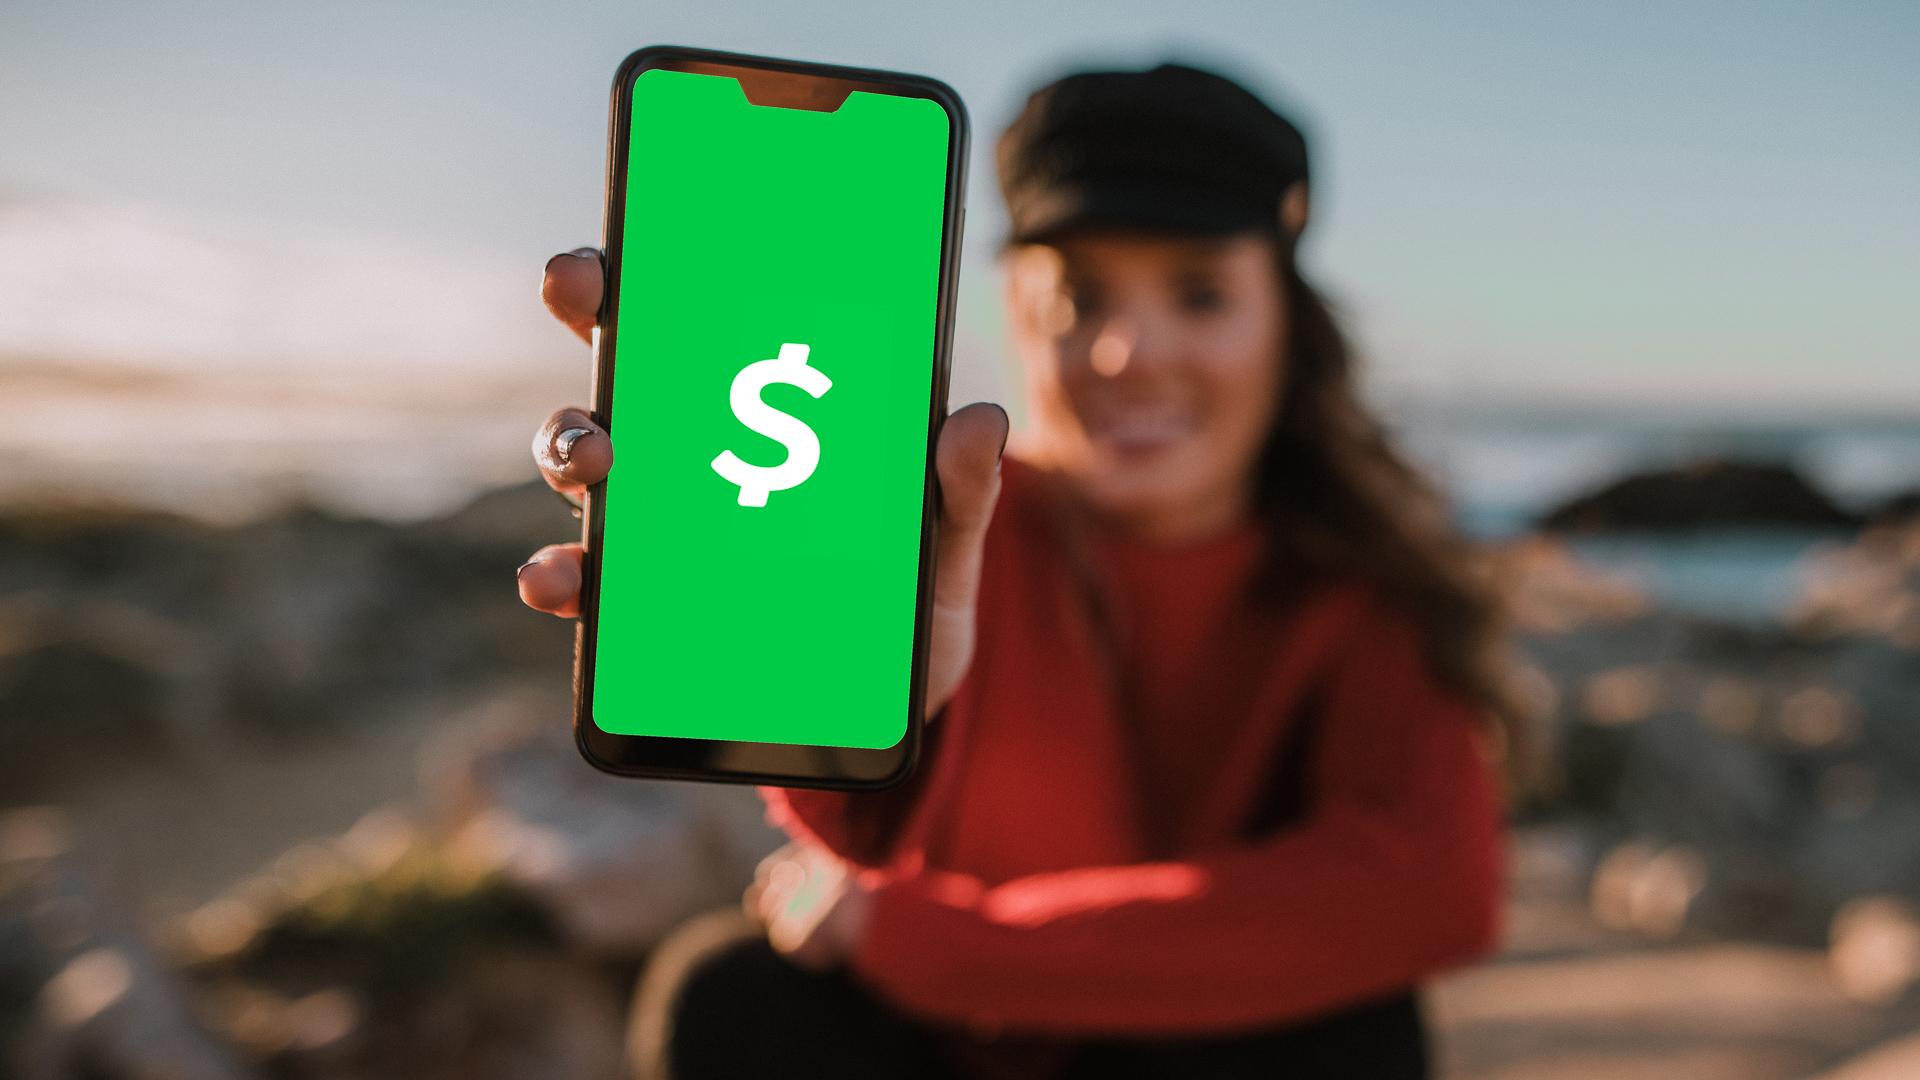 How To Get Stolen Money Back From Cash App